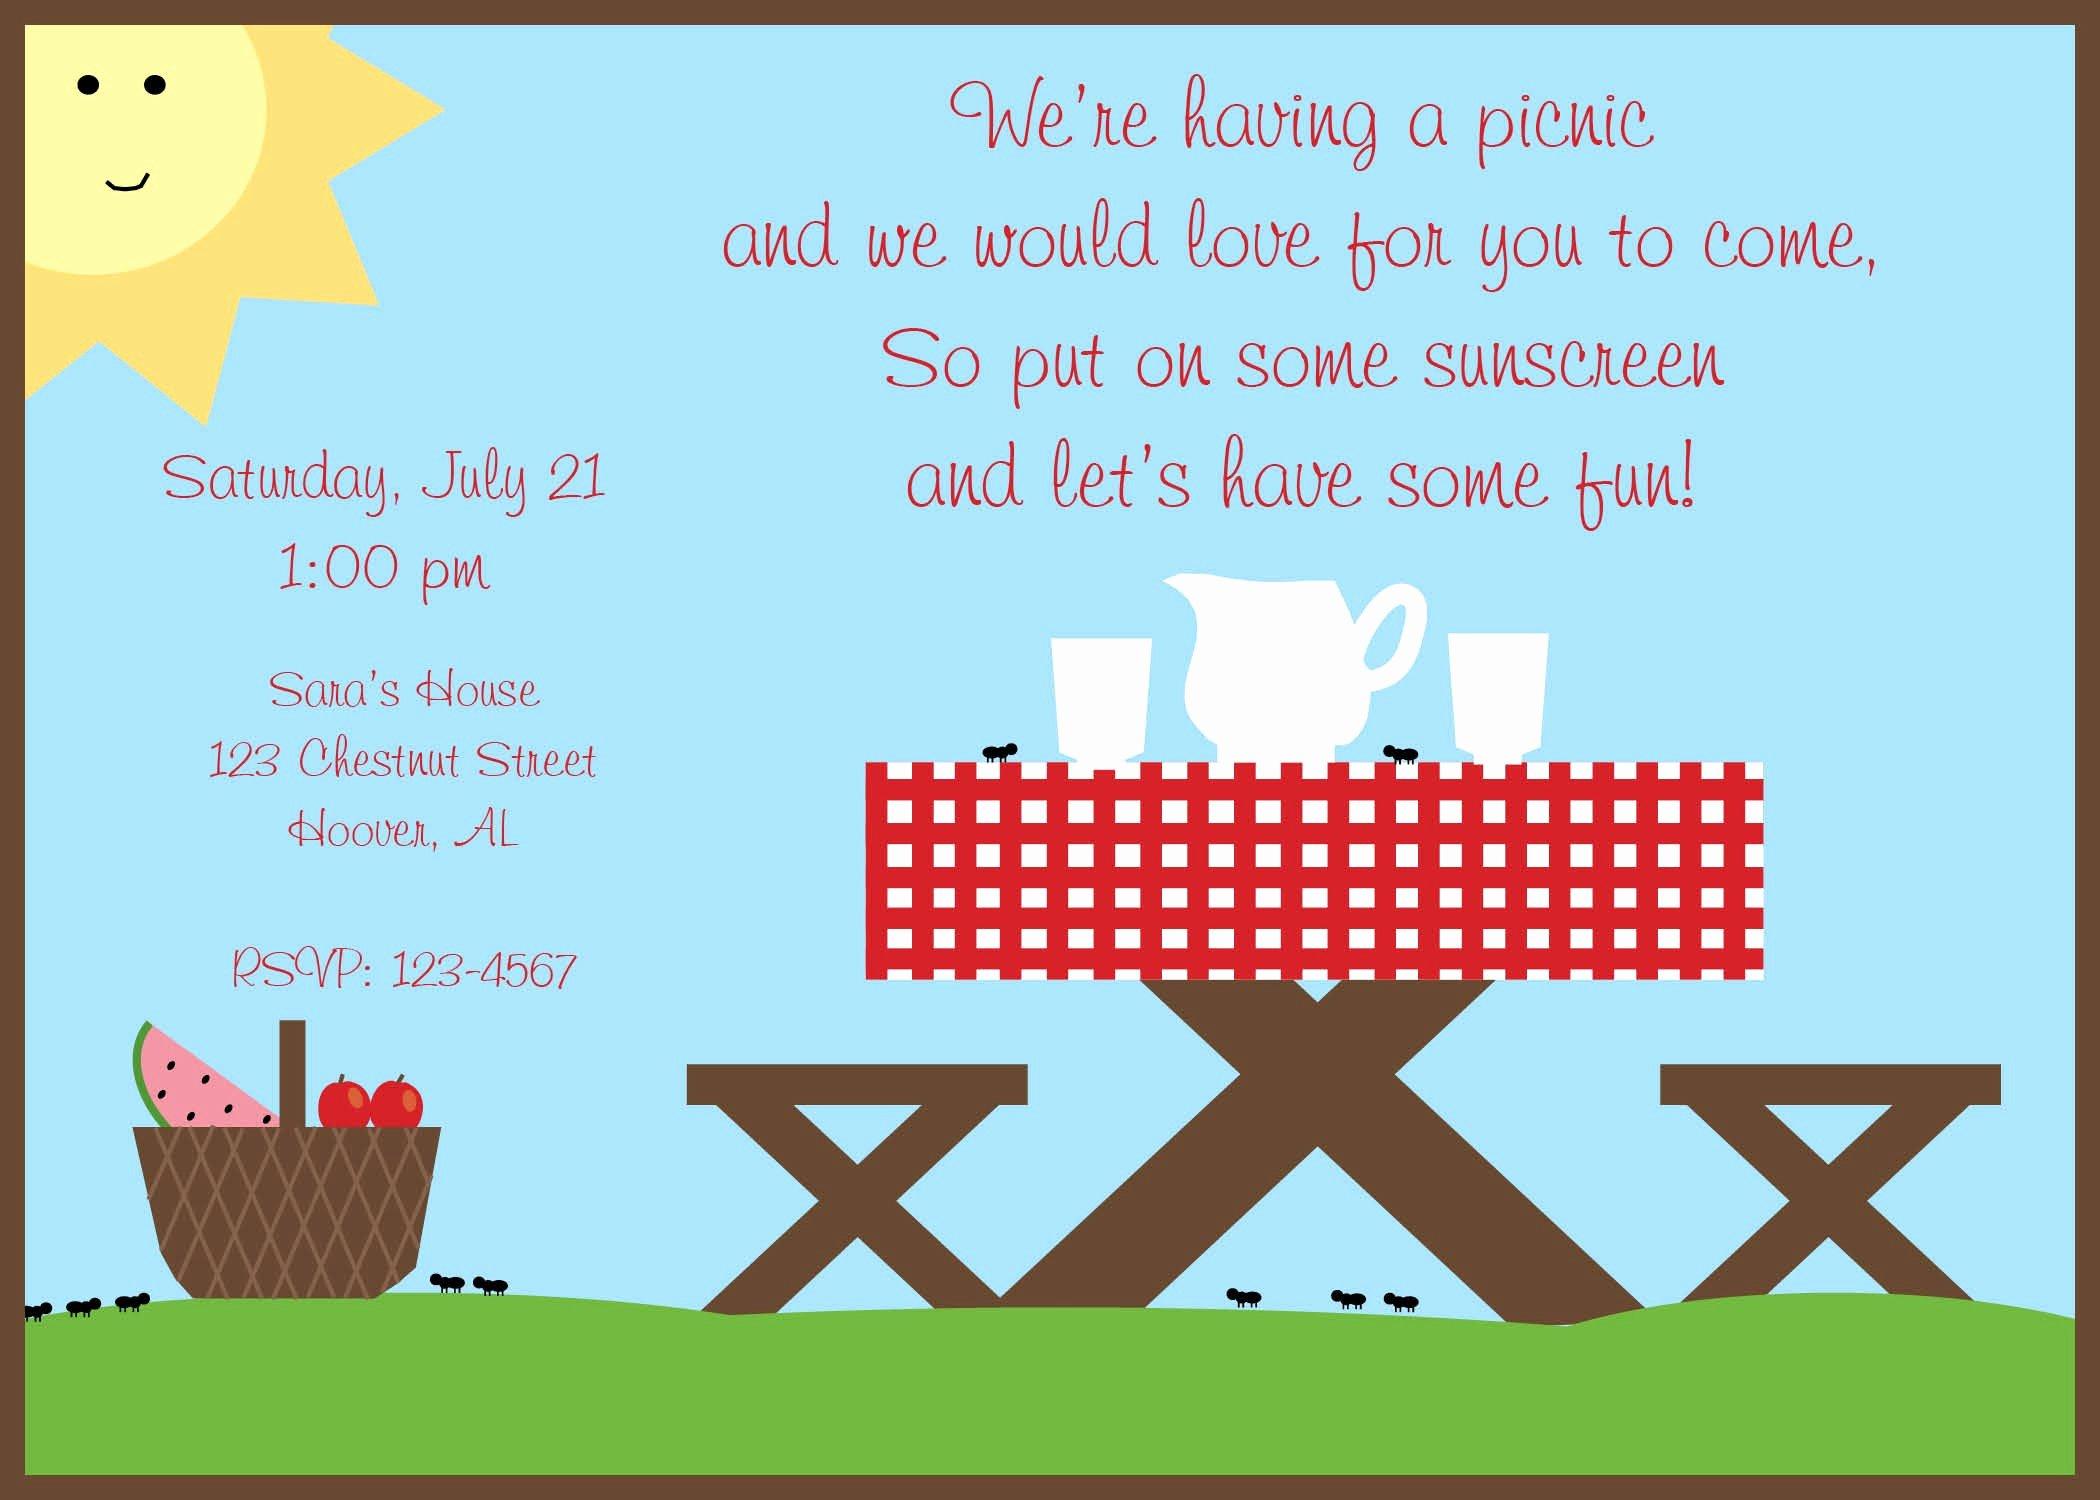 Free Picnic Invitation Template New Summer Picnic Invitation Summer Party by Lilypadboutiquestore